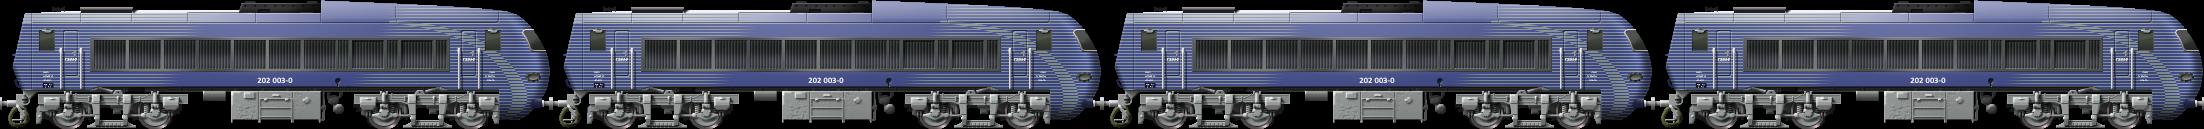 DB 202 Cargo